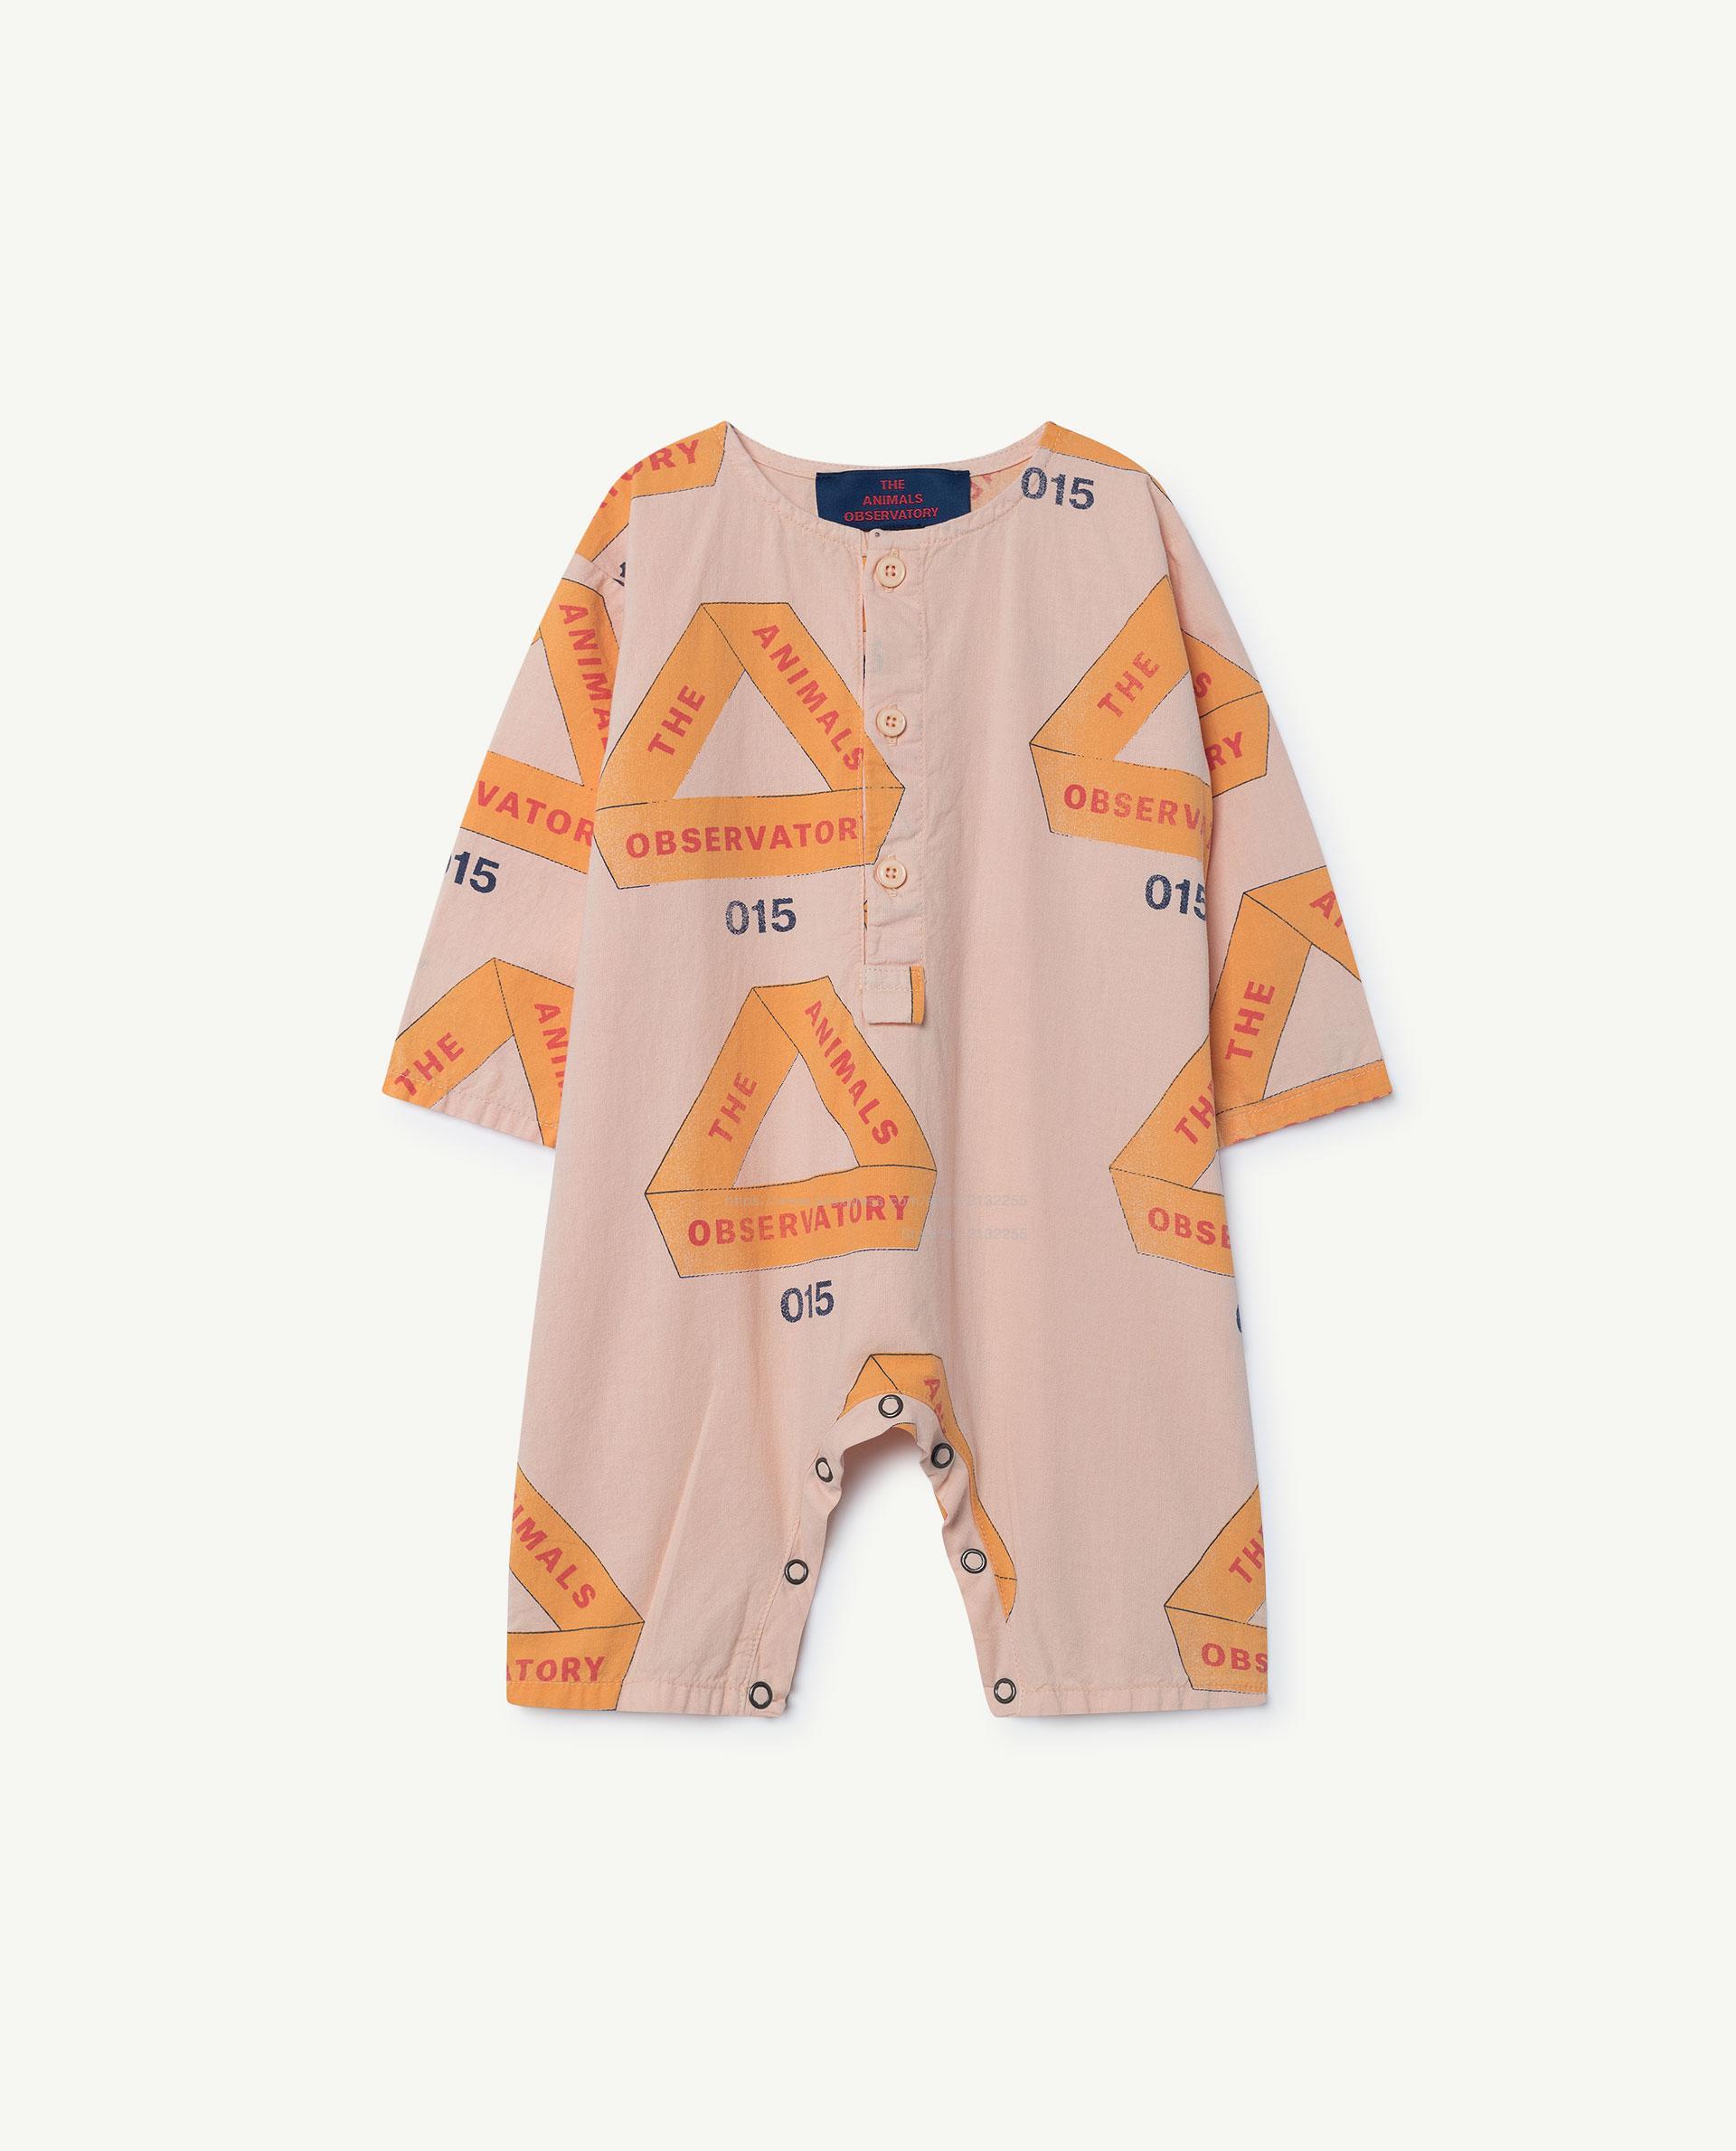 8d6ca15af3d3 Newborn Baby Boy Clothes 2018 Autumn Winter Tao Brand New Infant ...